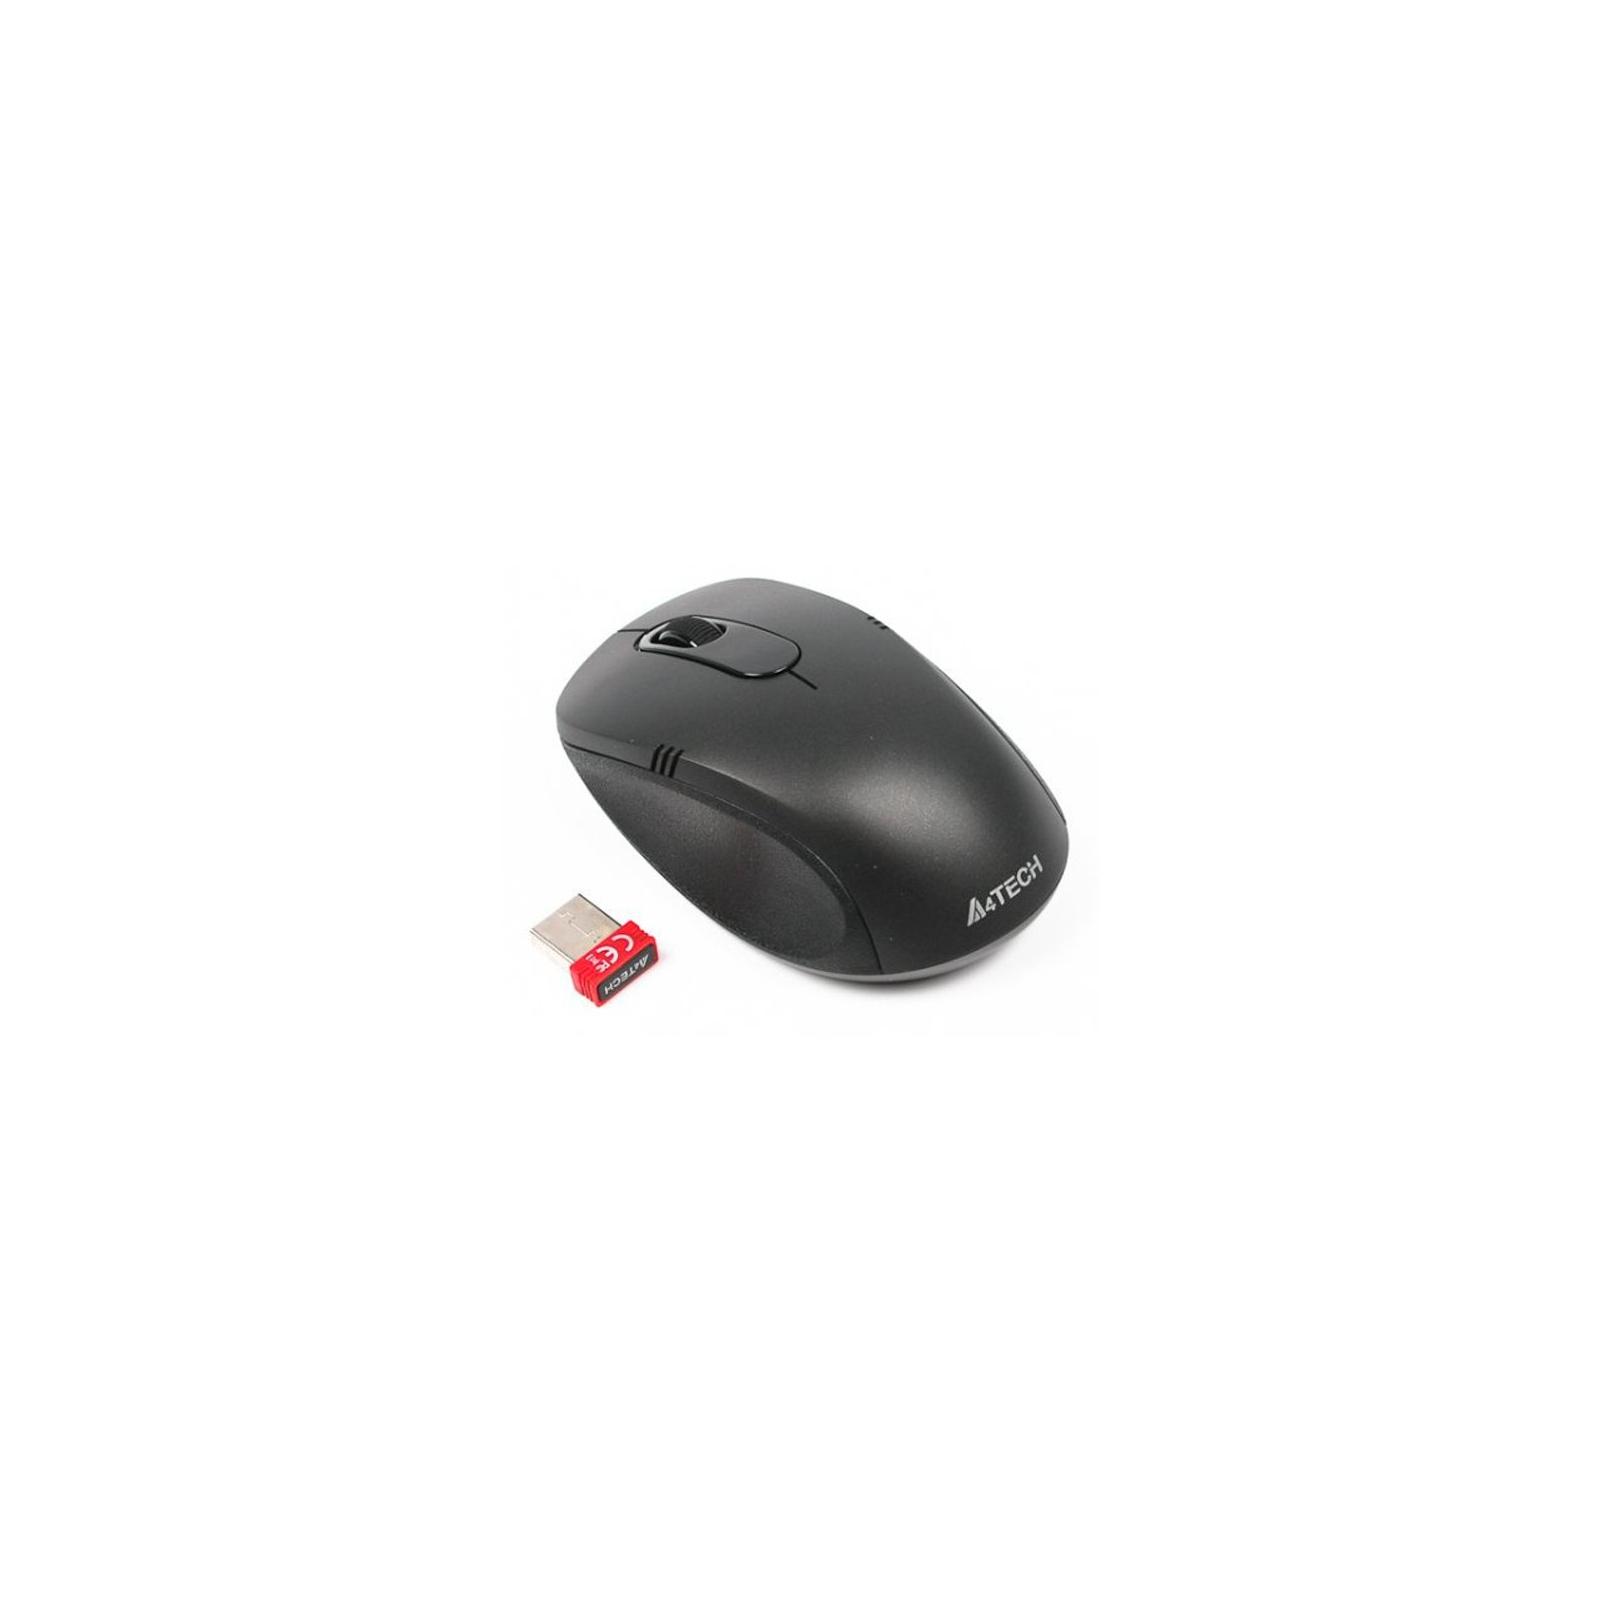 Мышка A4Tech G3-630N Black изображение 4